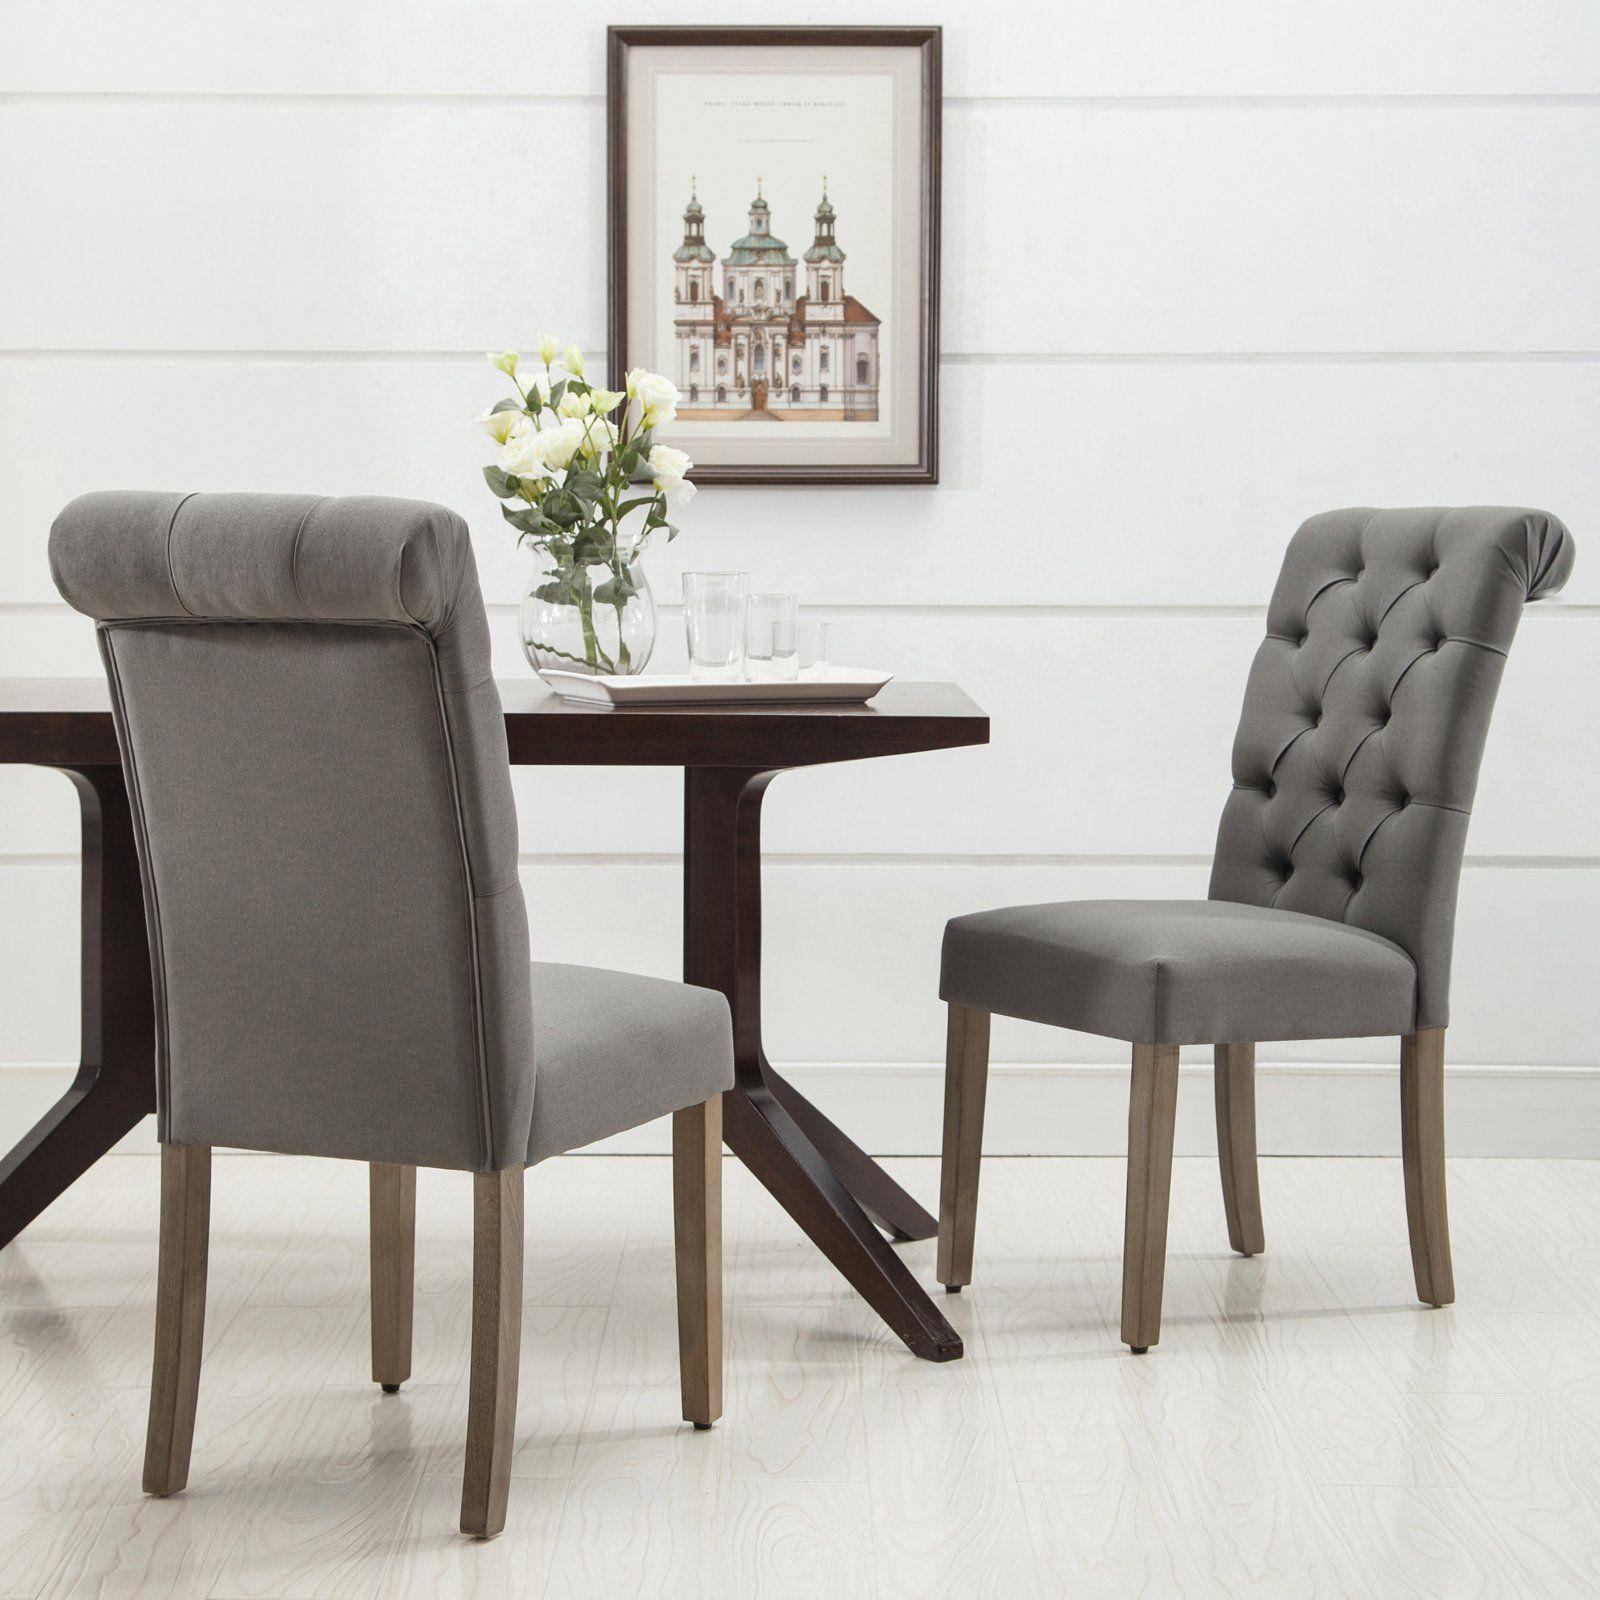 christies home living natalie button diamond tufted dining chair rh pinterest es